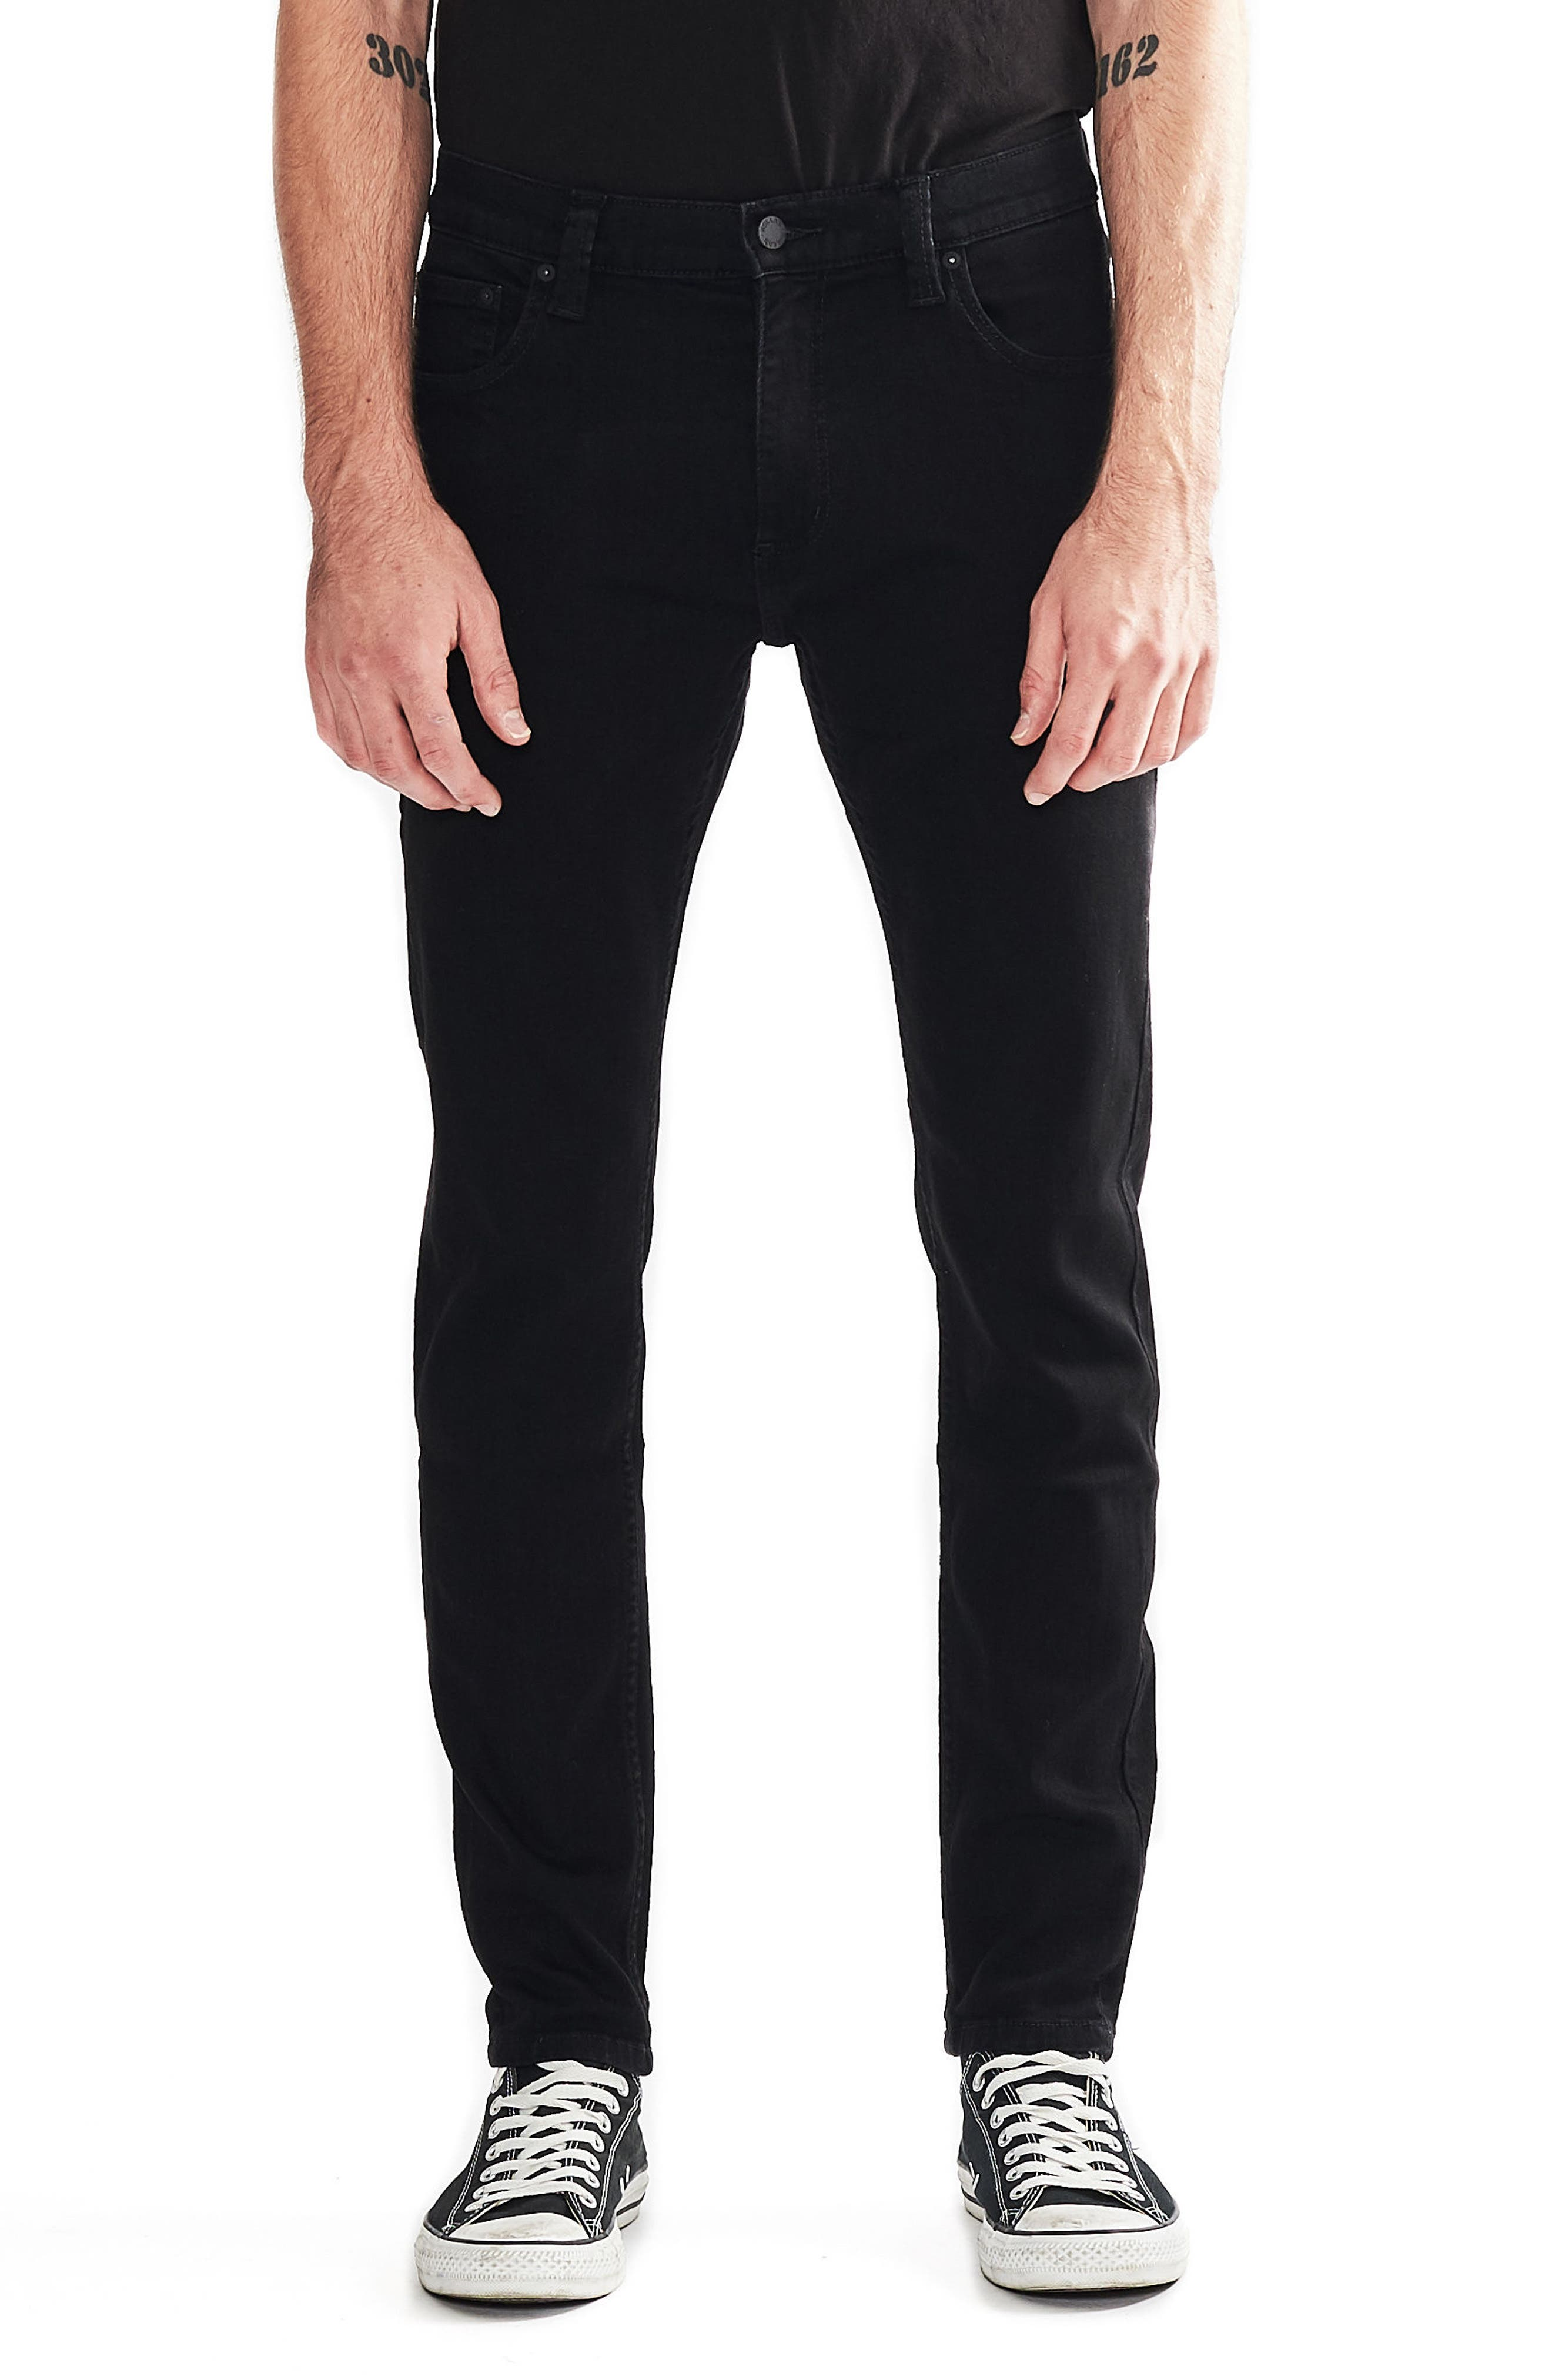 Men's Rolla's Stinger Skinny Fit Jeans